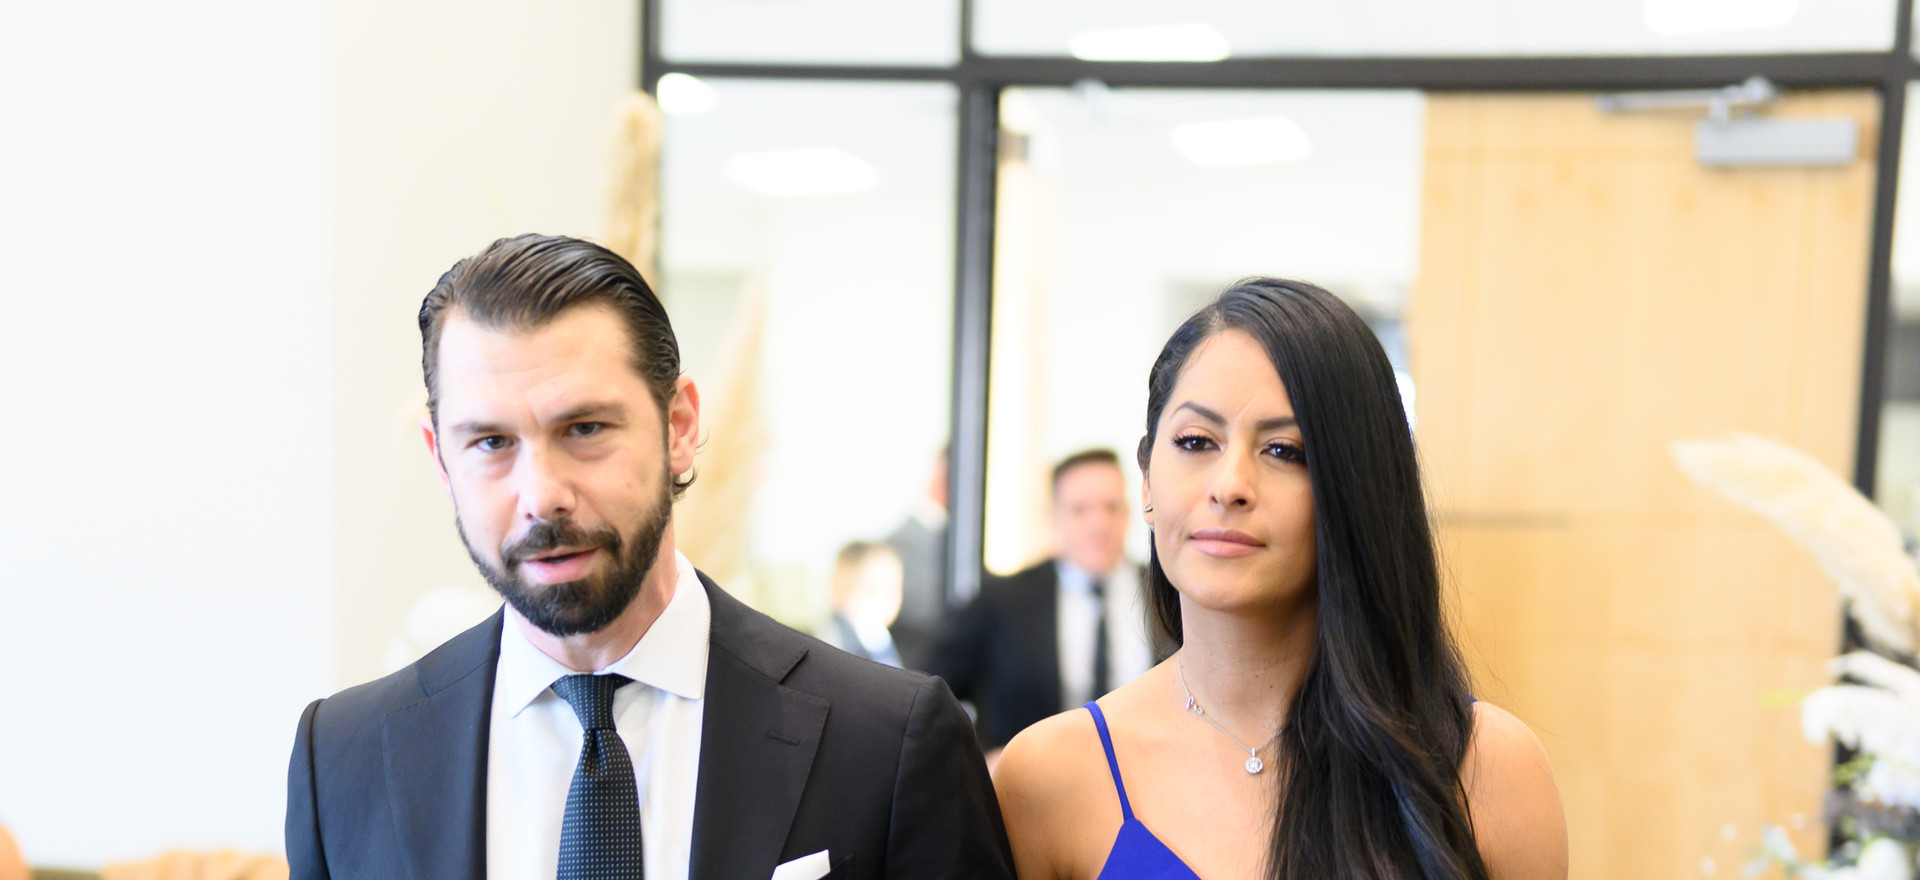 045_Lorena and Mike's Wedding day.jpg